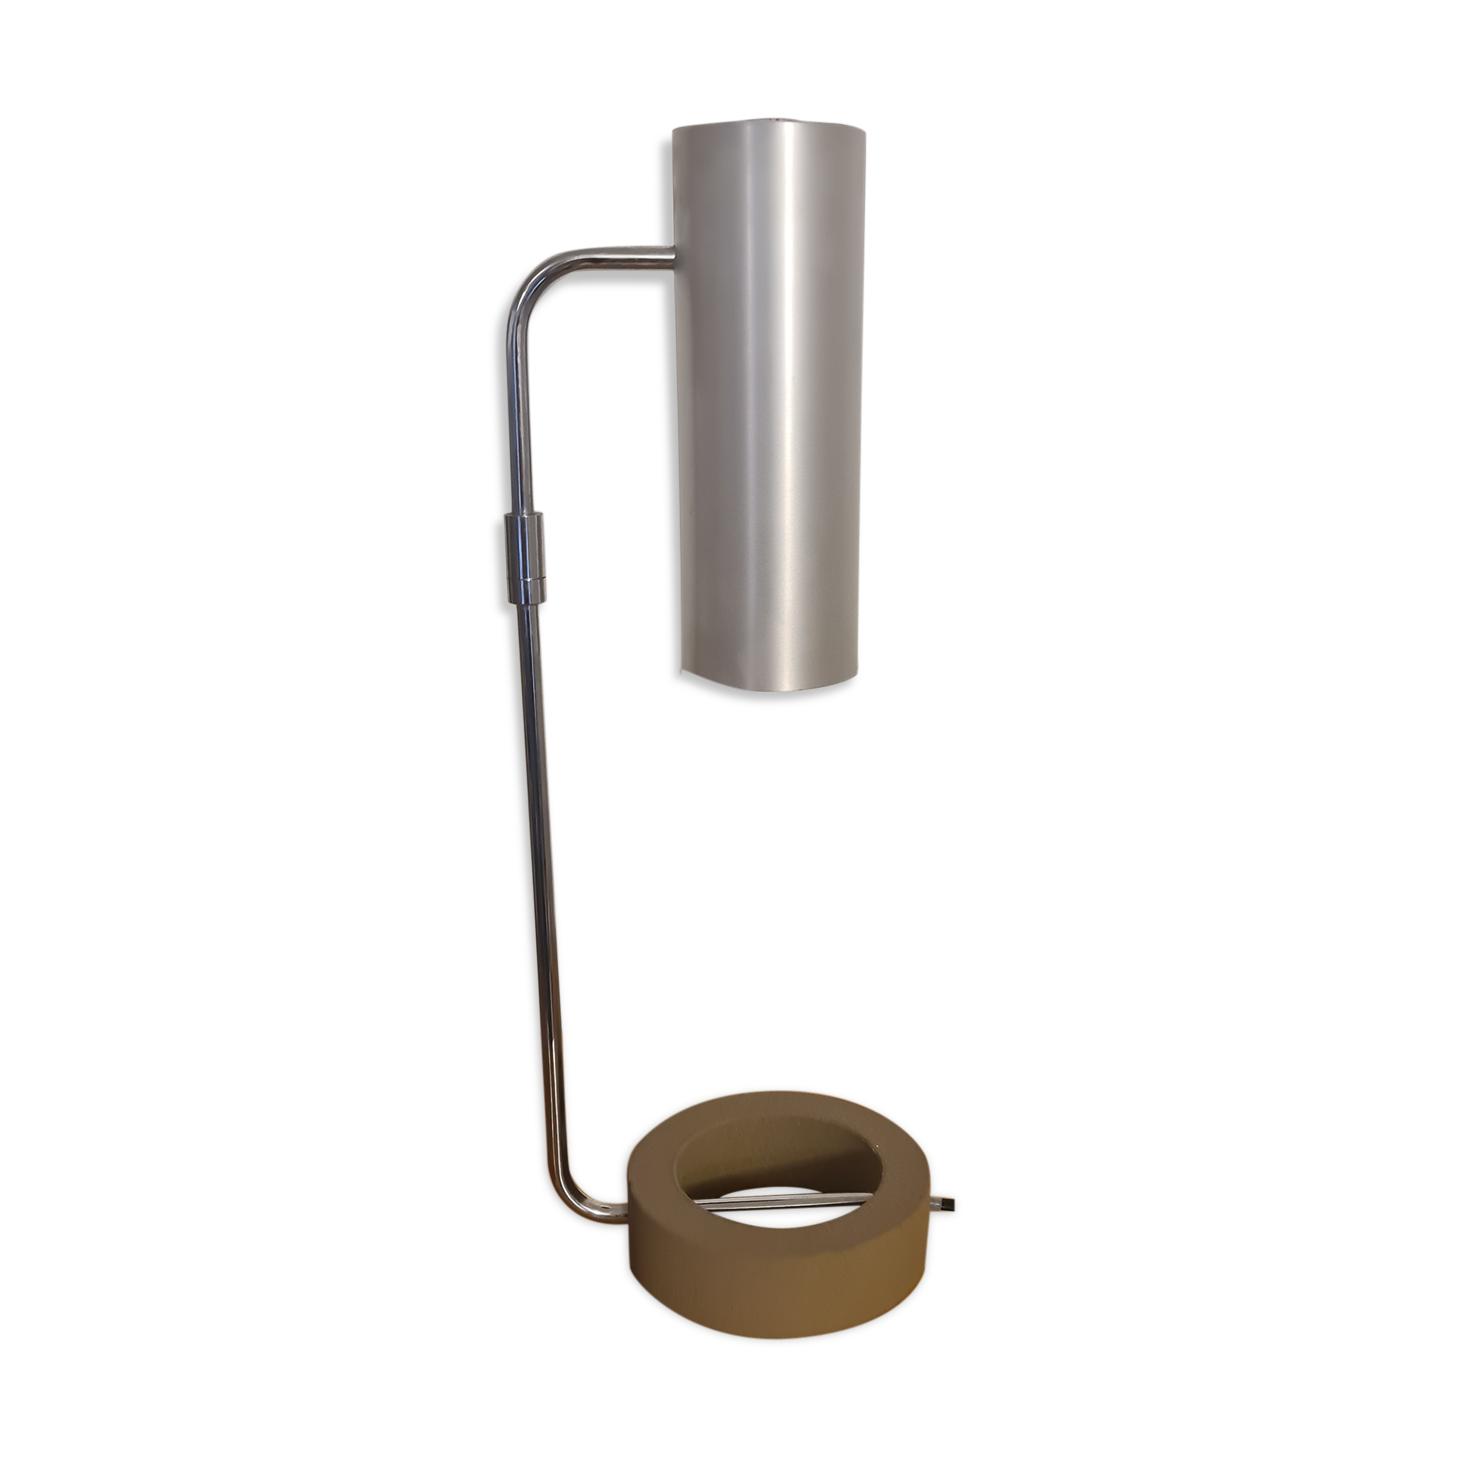 Lampe de bureau vintage habitat Tangola (design Suisse)